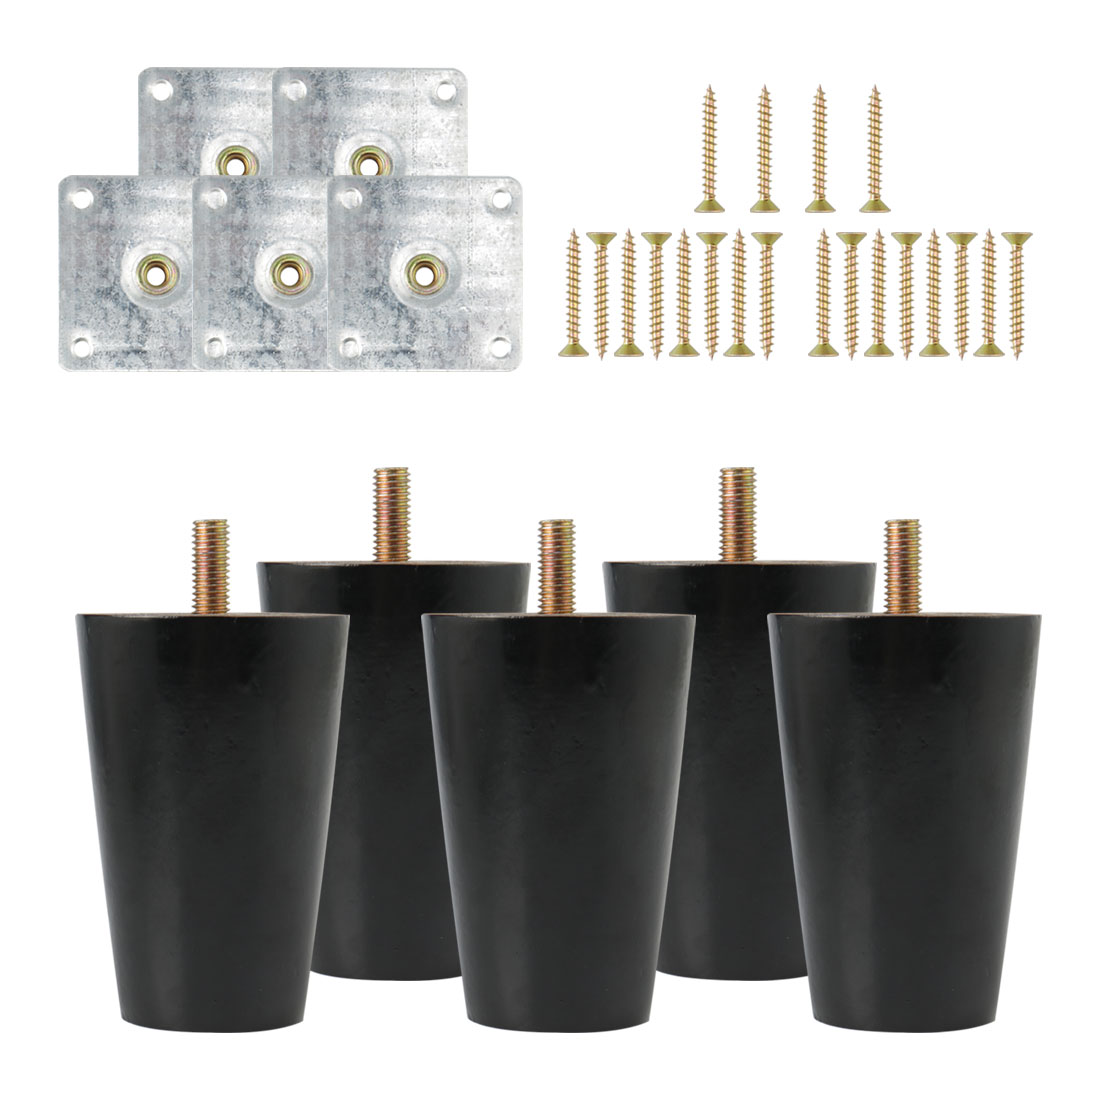 "3"" Solid Wood Furniture Leg Table Feet Hoist Adjuster Replacement Black Set of 5"